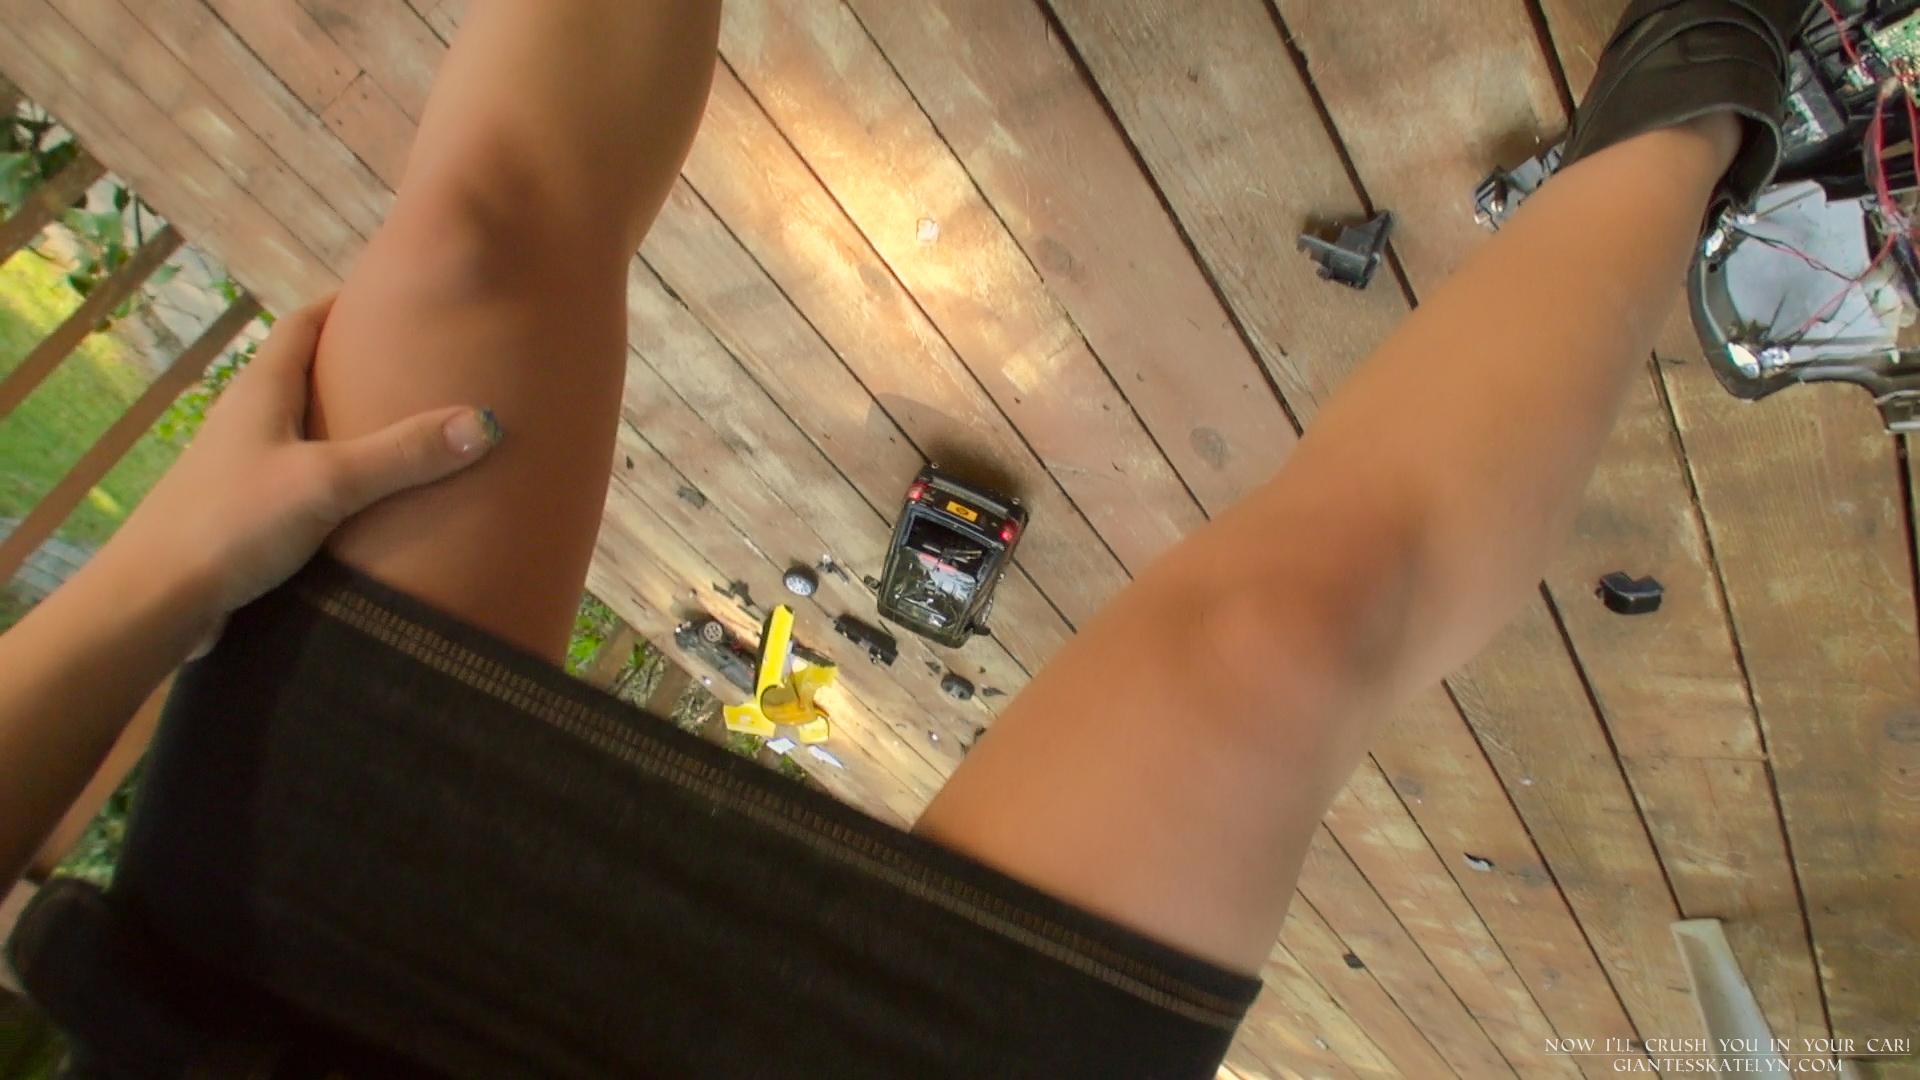 Skinny teen girl self shot jb